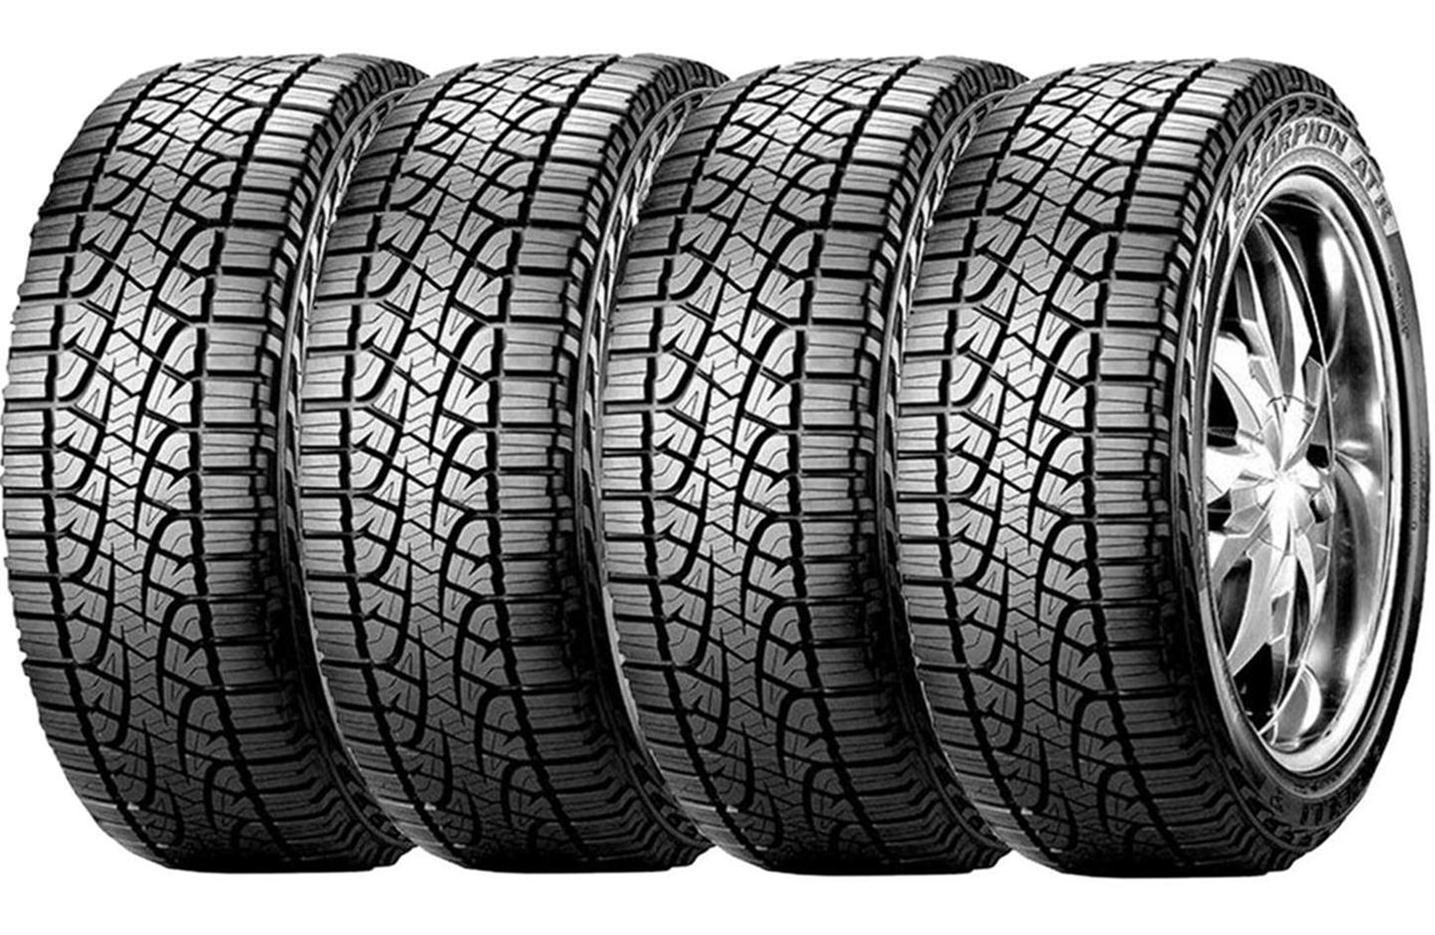 Combo 4 Pneus 225/65r17 106h Tubeless Xl Scorpion Atr Pirelli